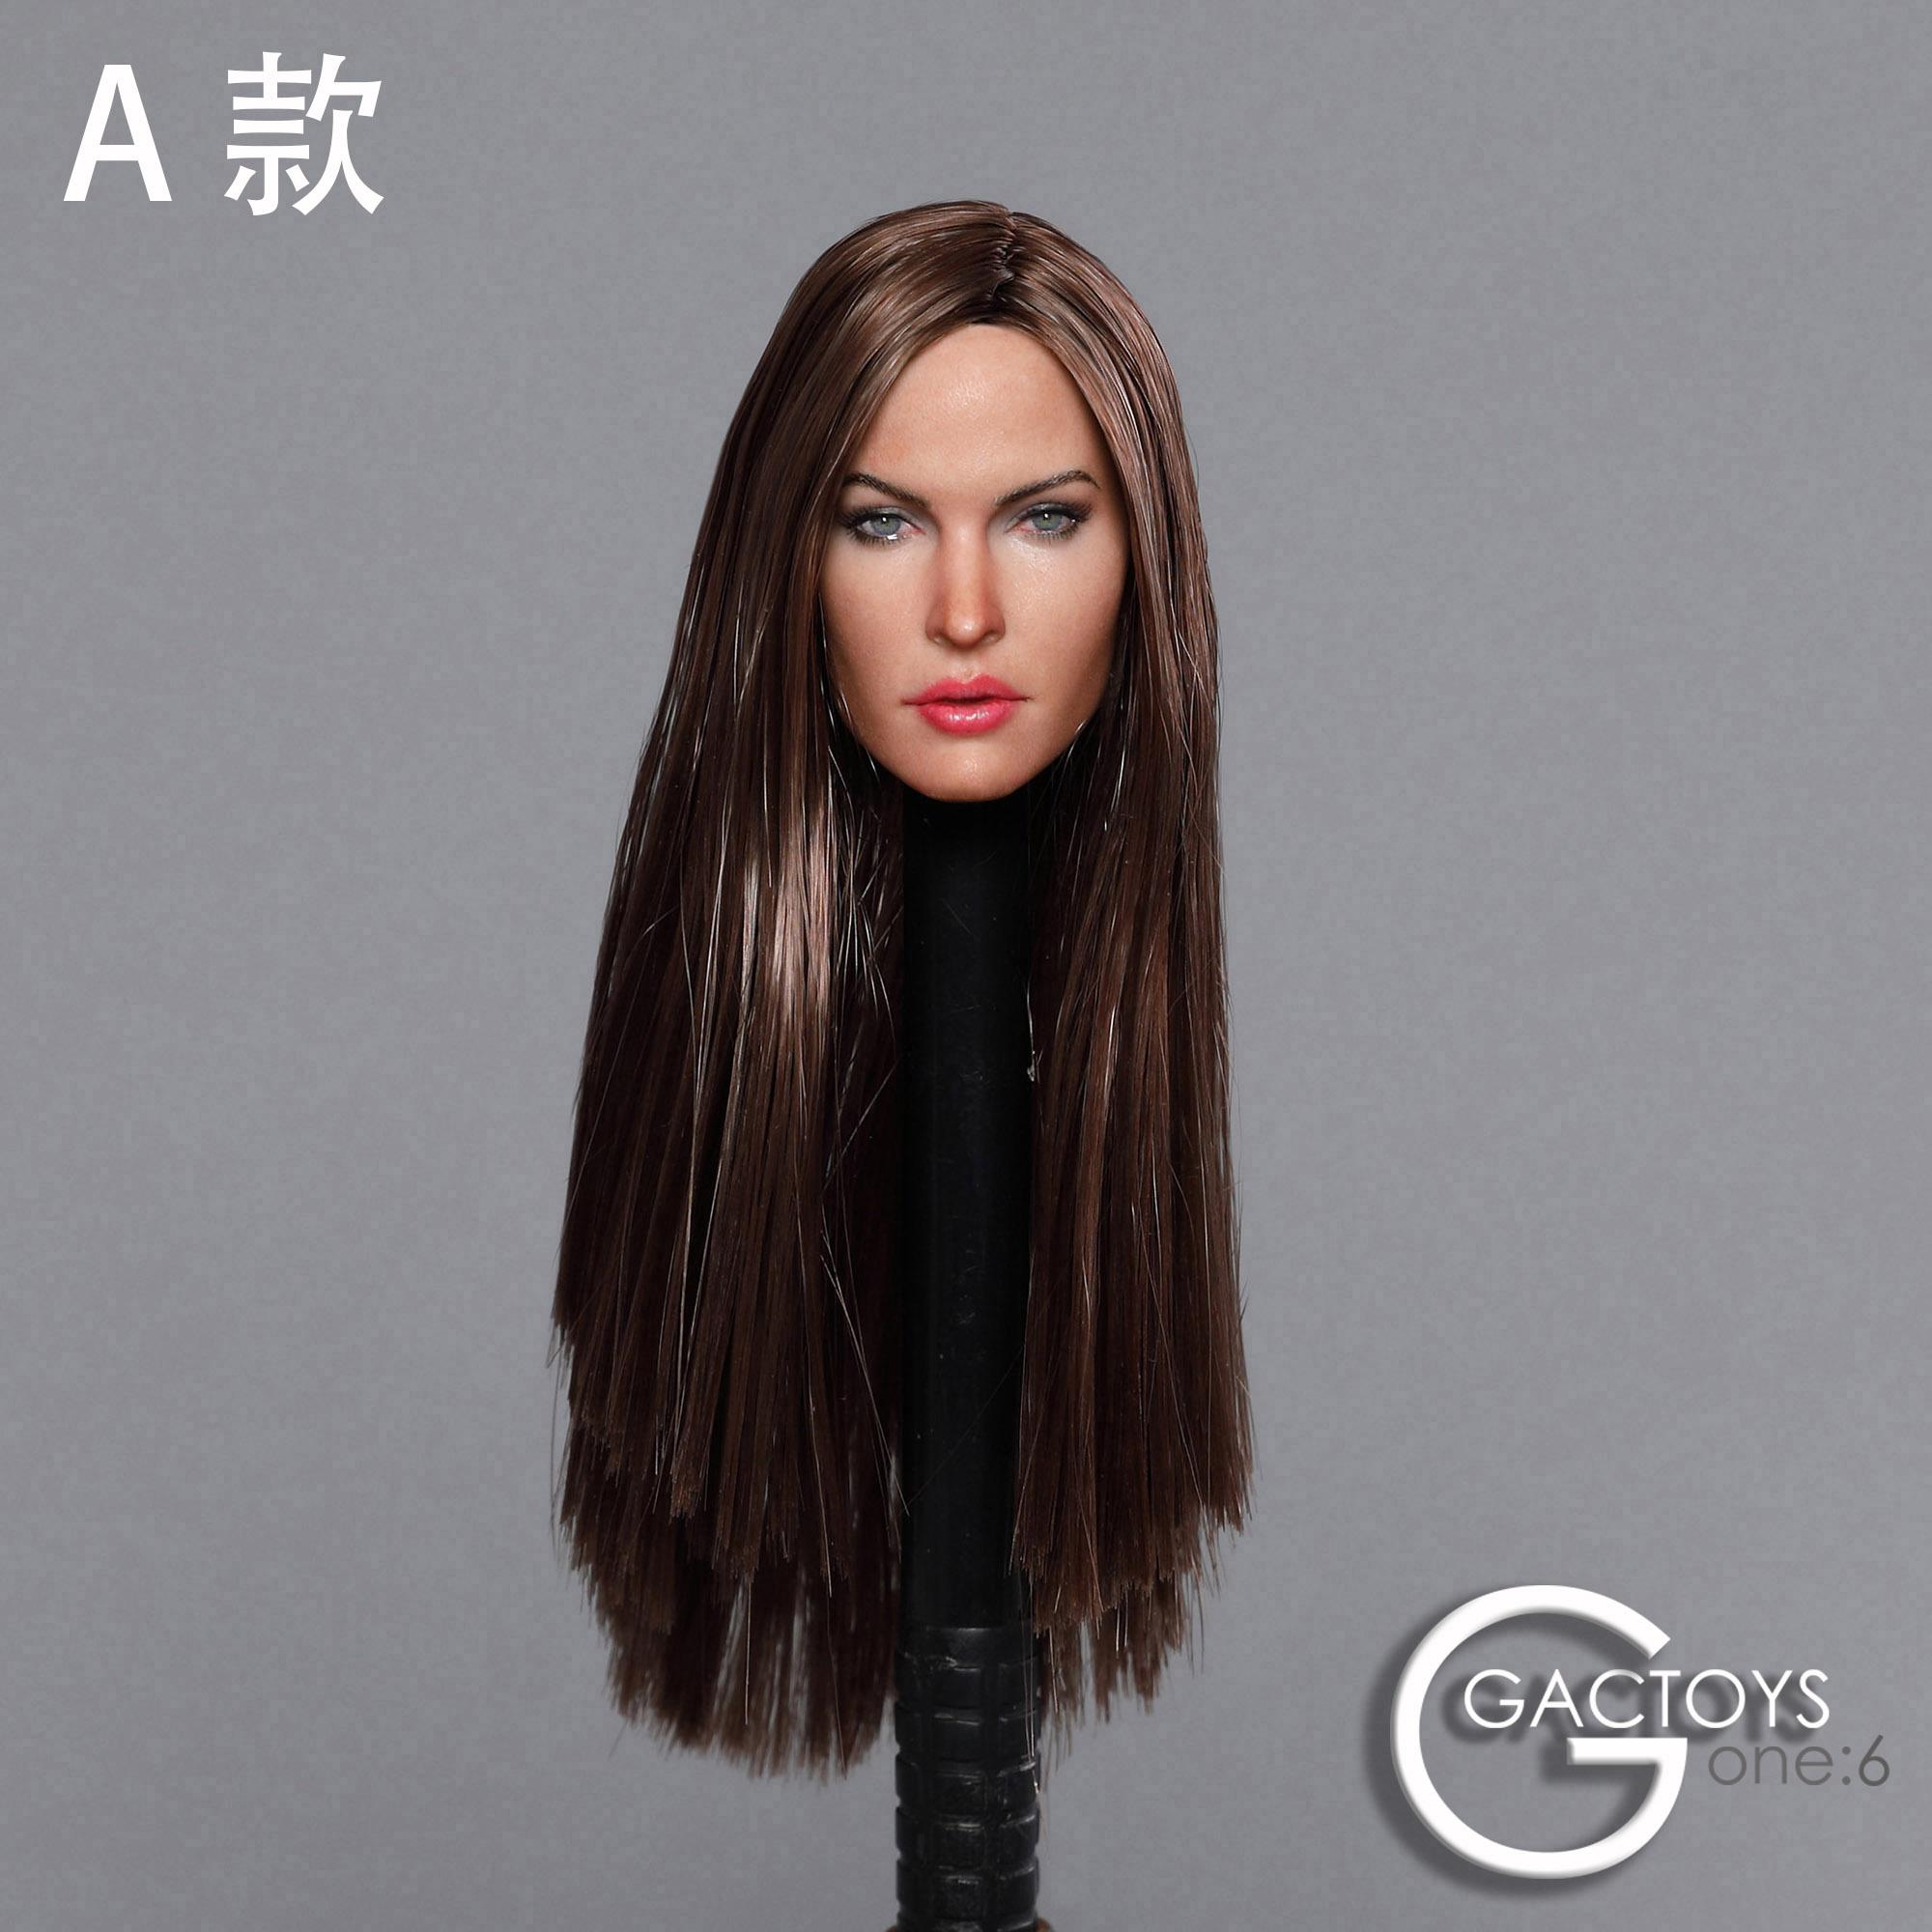 gac-femalehead01